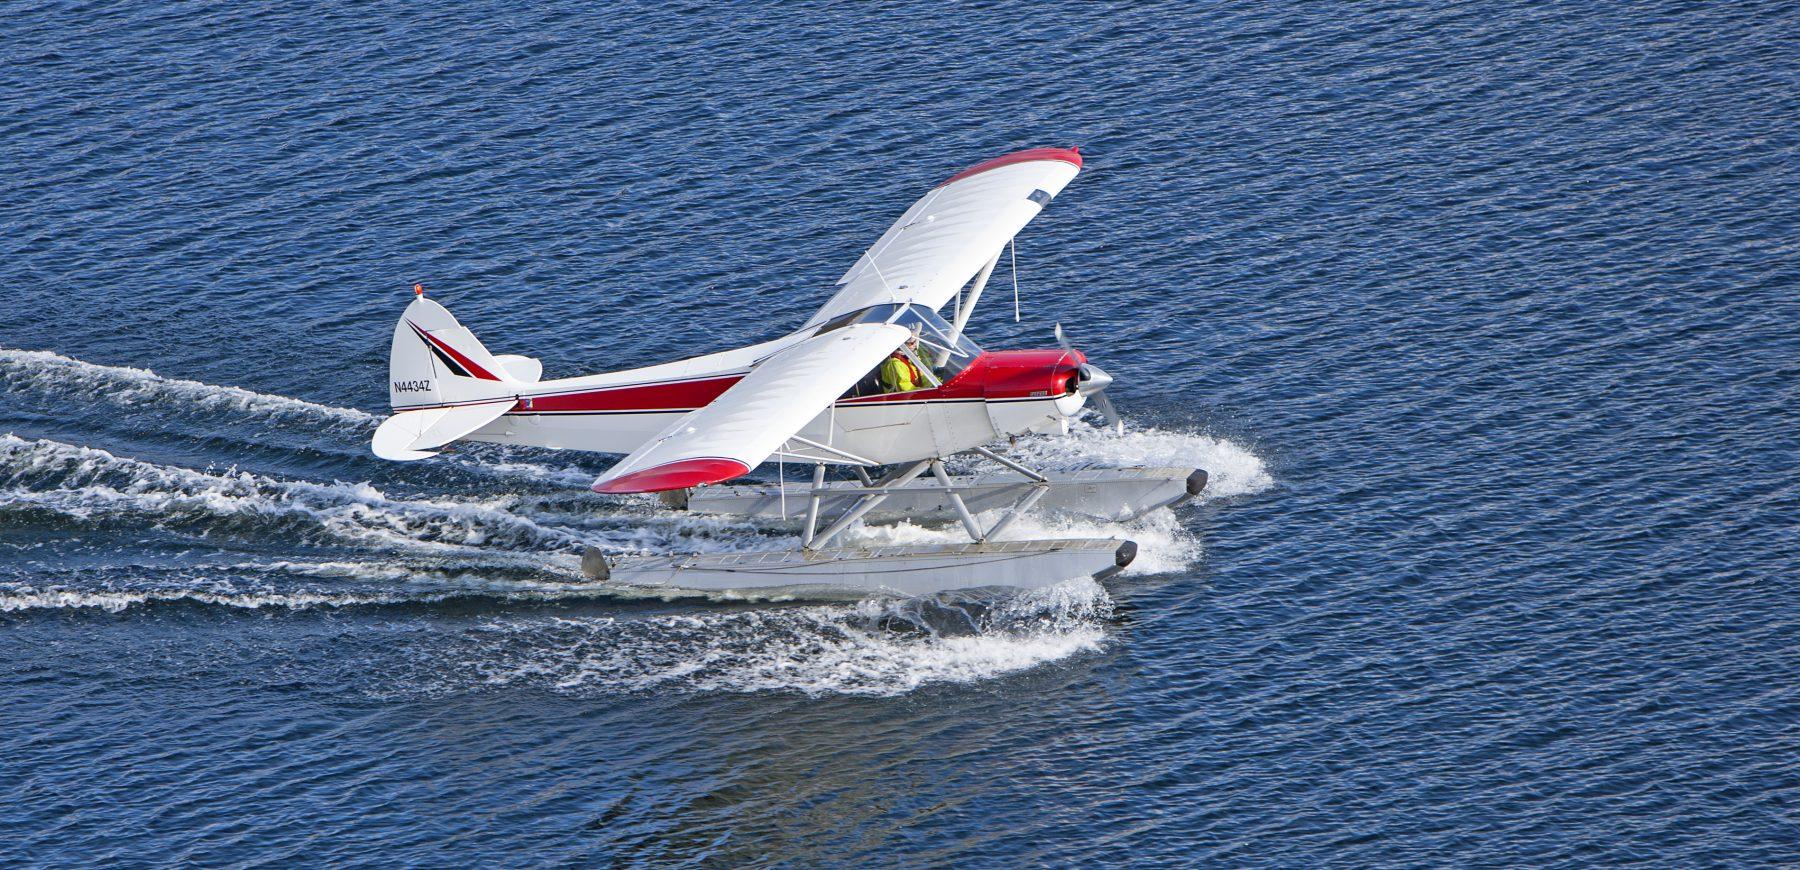 Super Cub Seaplane on Water